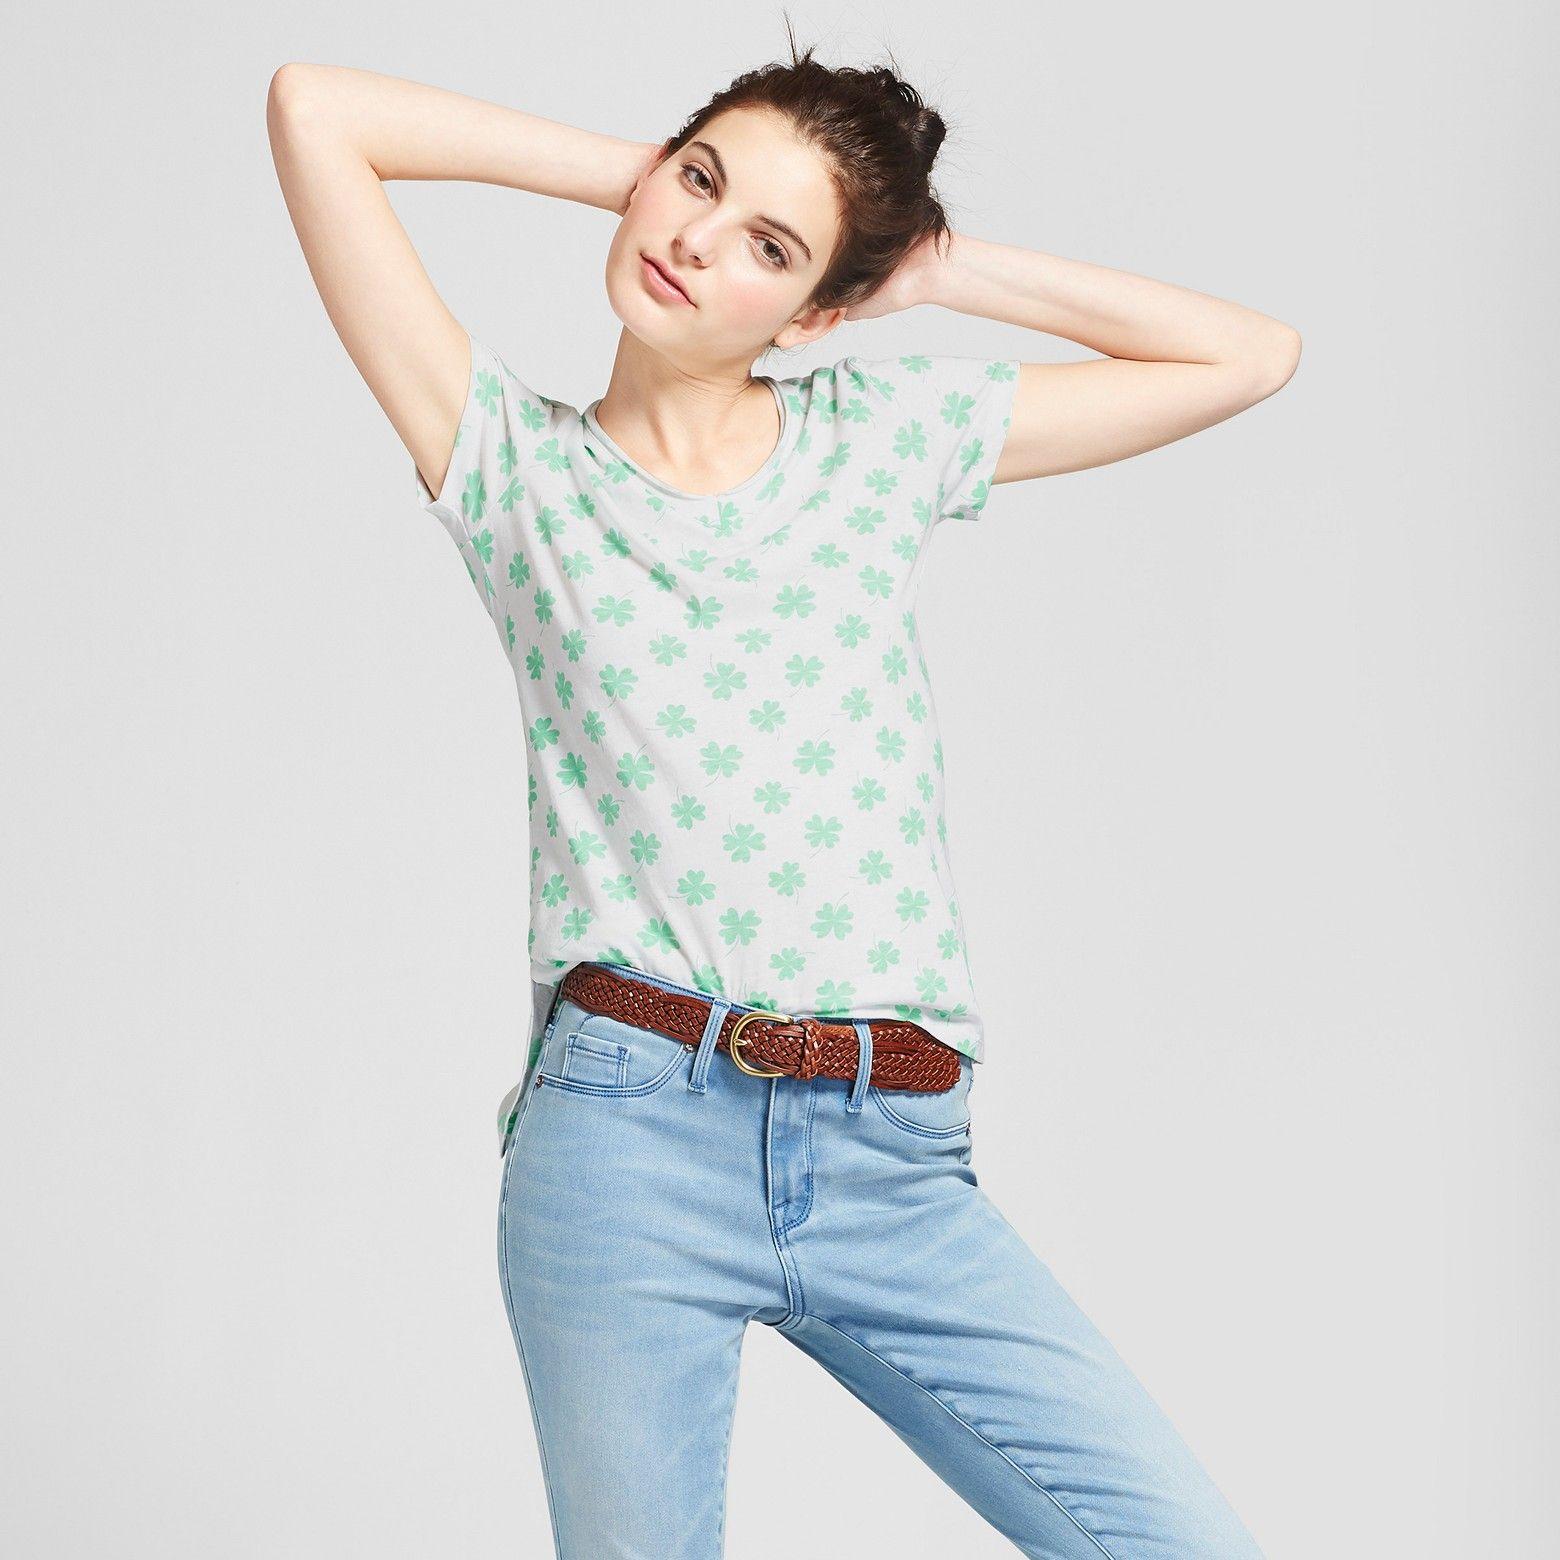 c27d10845ccf1 Women s St. Patrick s Day Short Sleeve V-Neck Graphic T-Shirt - Grayson